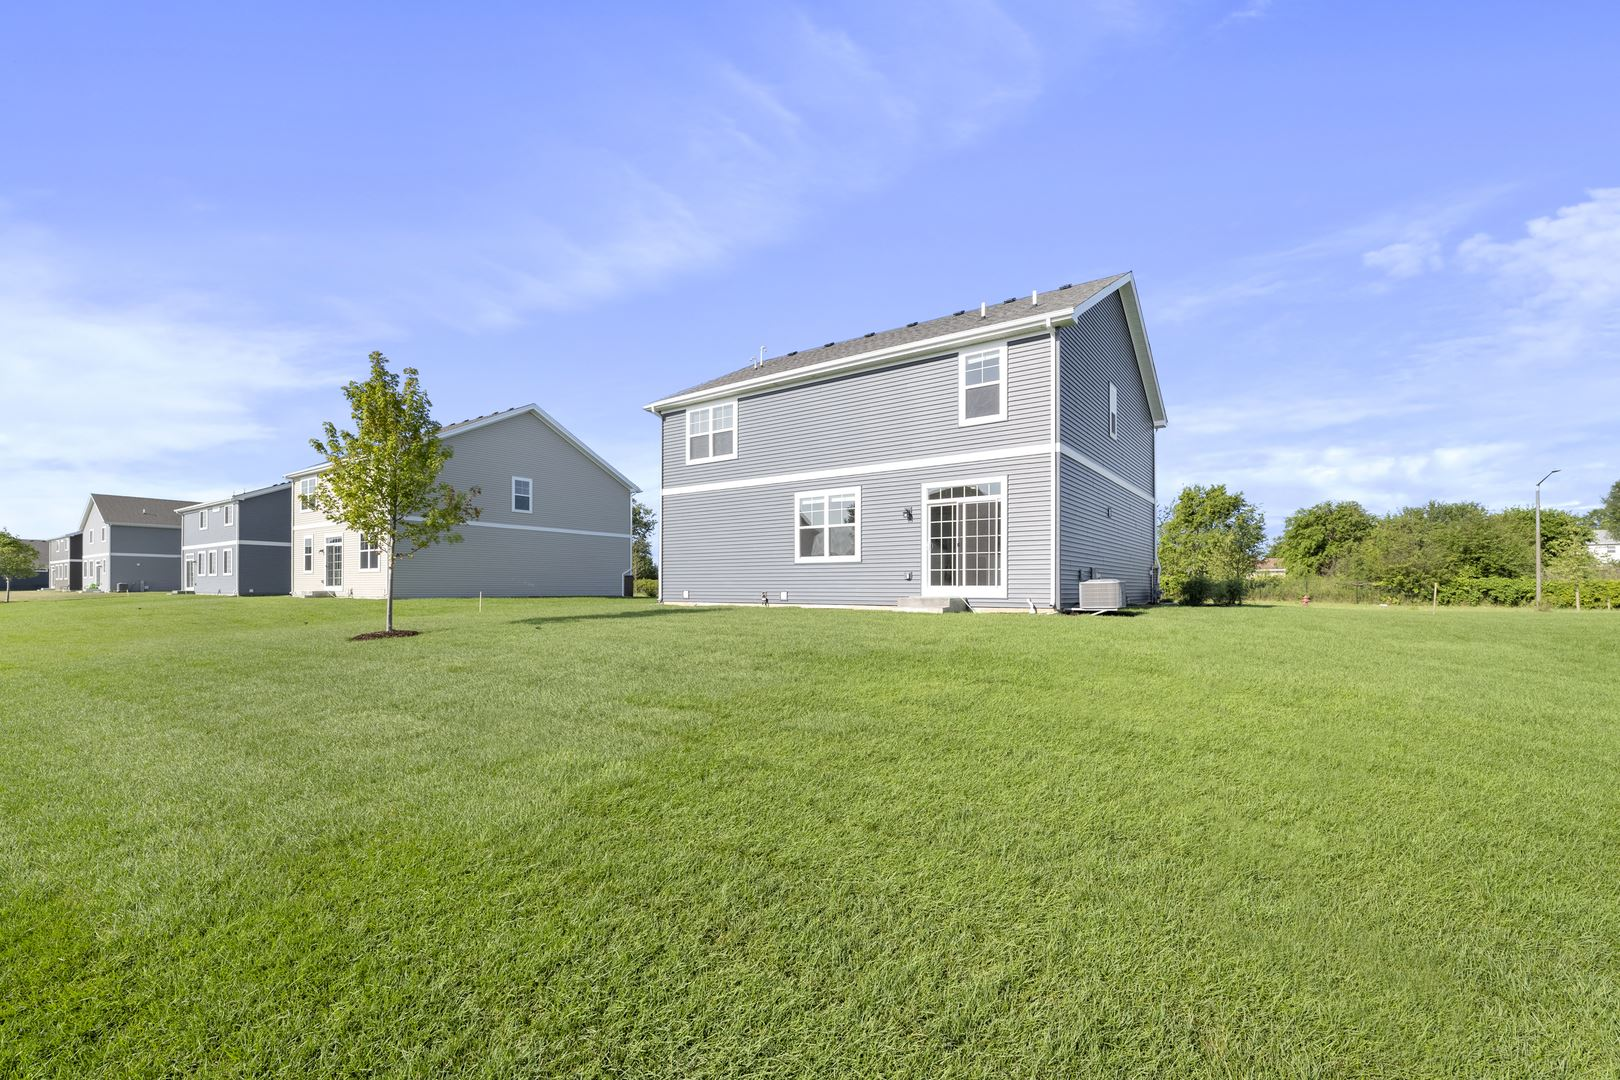 Photo of 16905 S Corinne Circle, Plainfield, IL 60586 (MLS # 11000170)